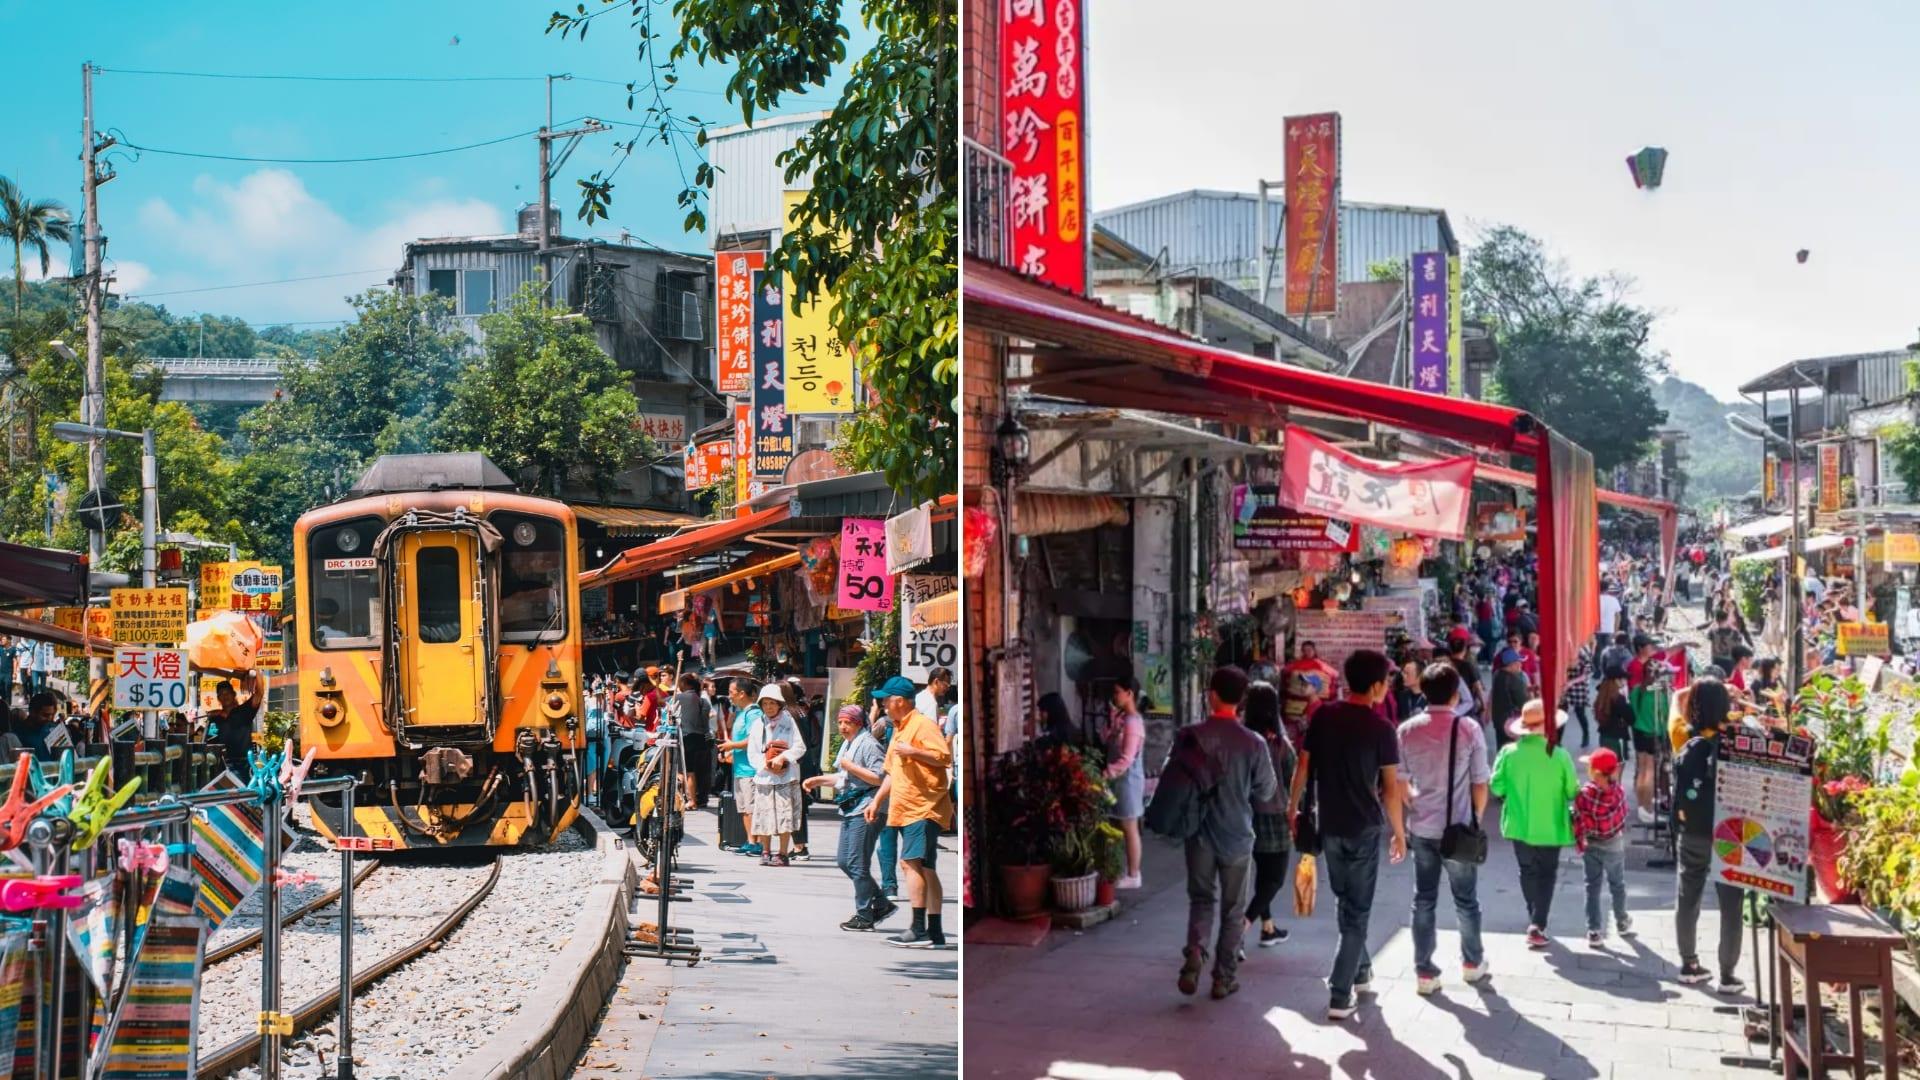 pingxi railway train